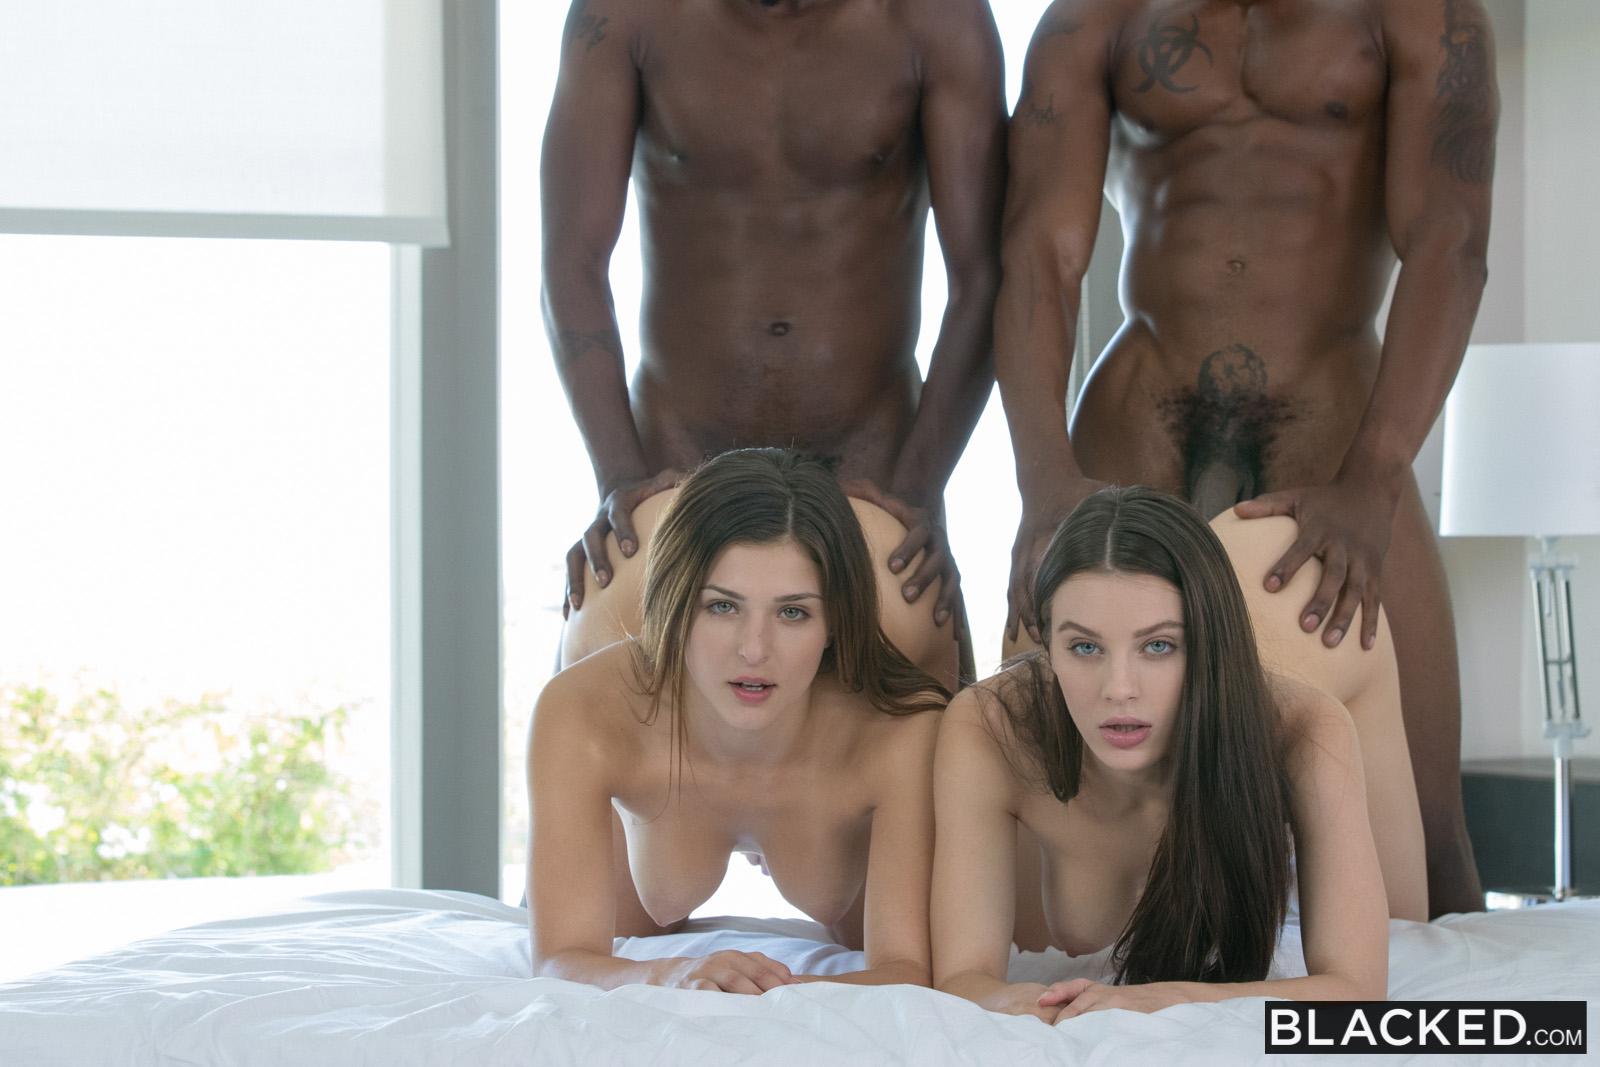 Lana rhoades ricky johnson onlyfans sex tape 6